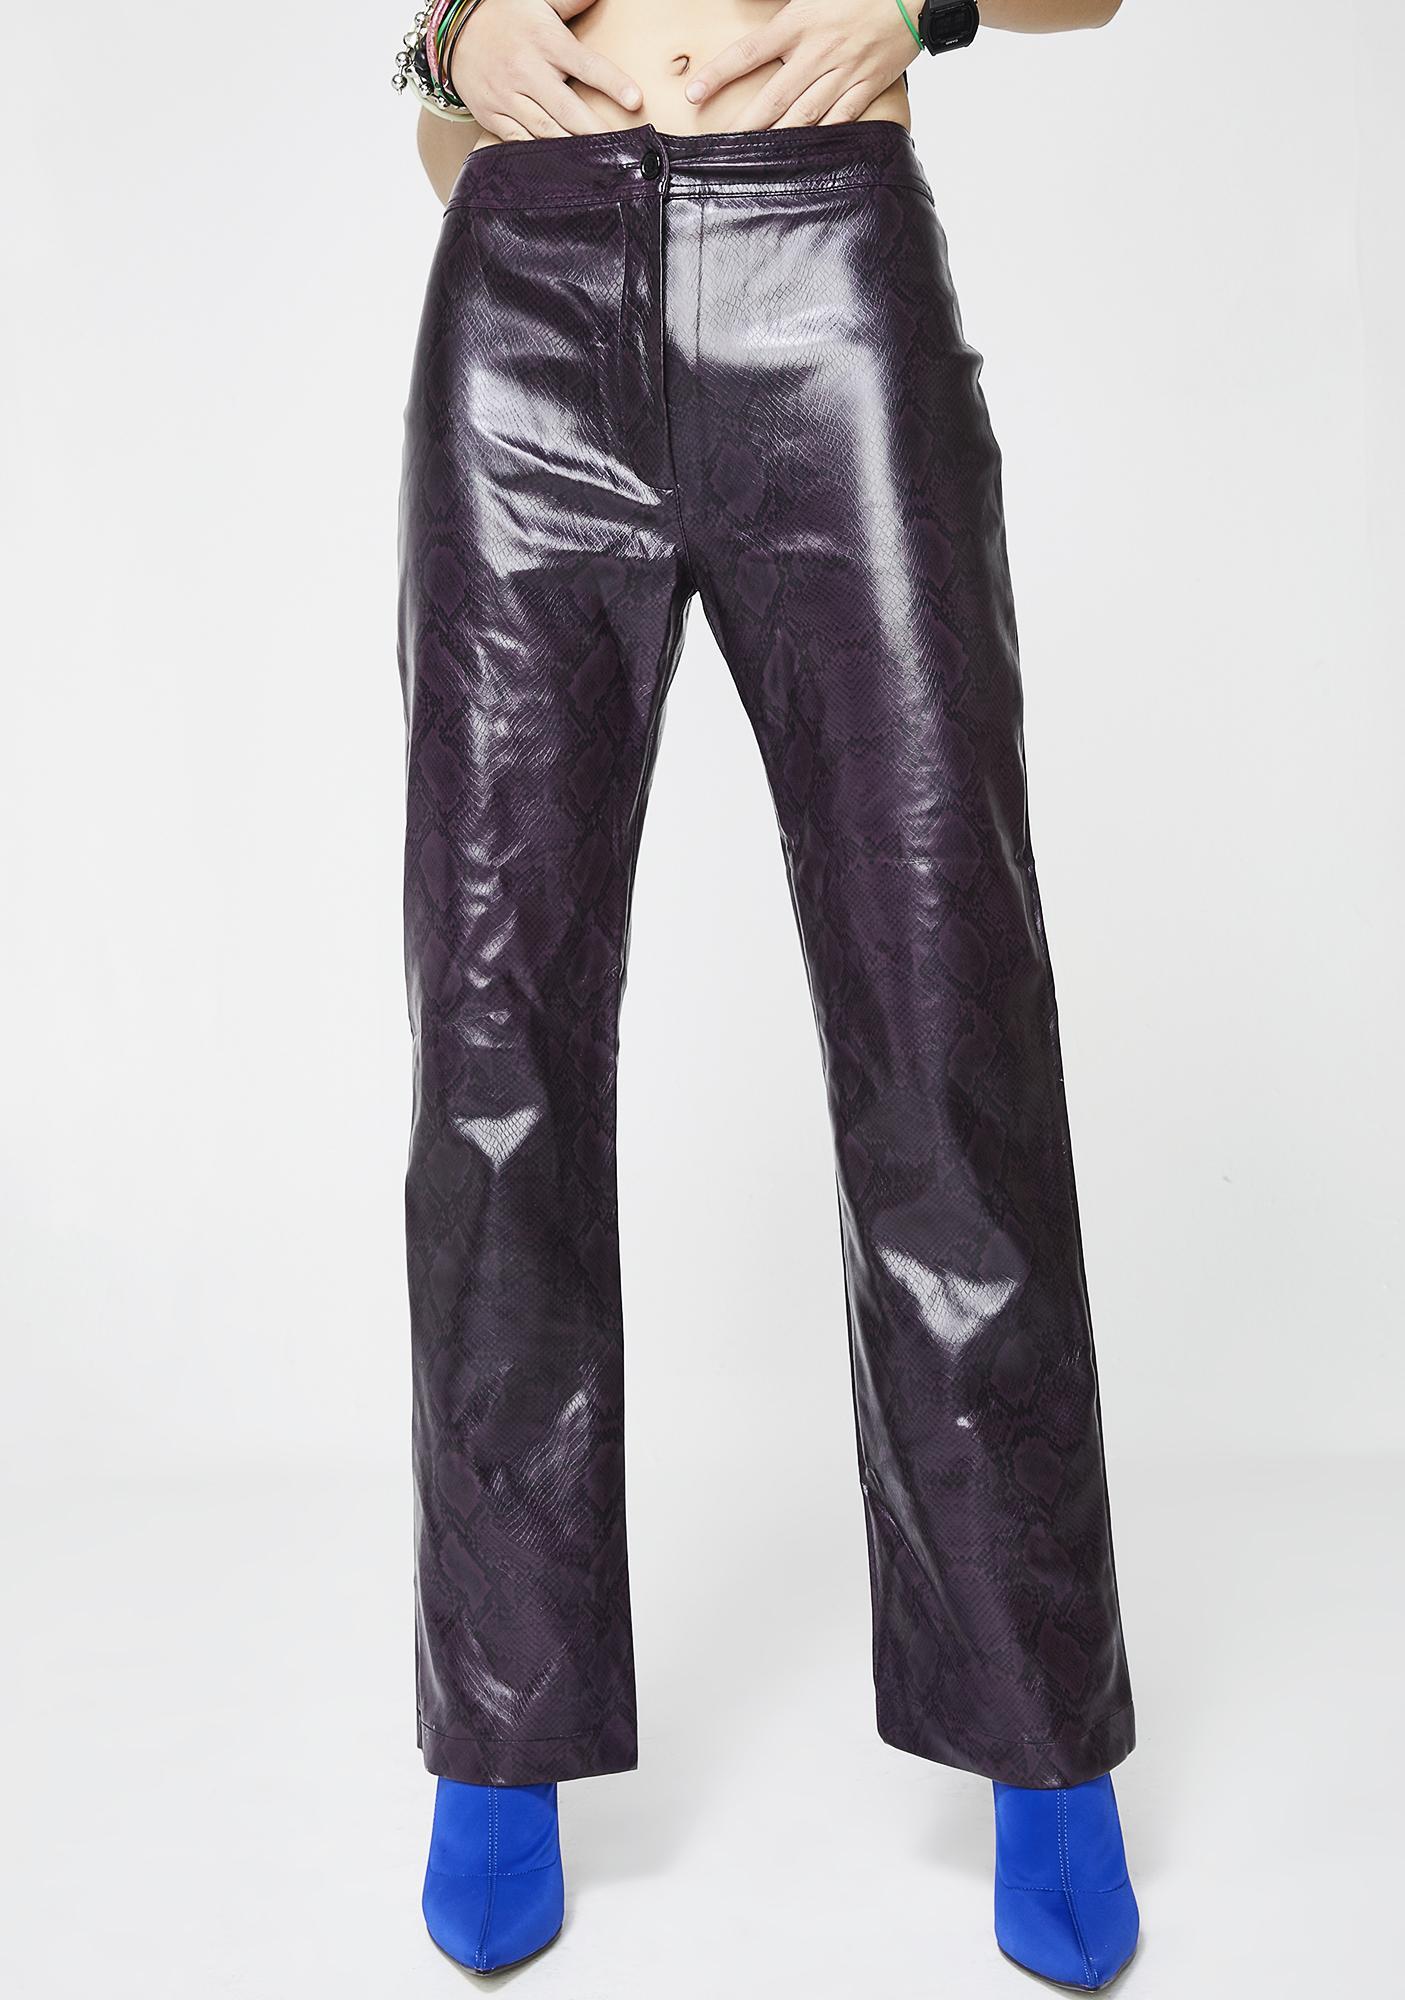 Vintage Snakeskin Pants